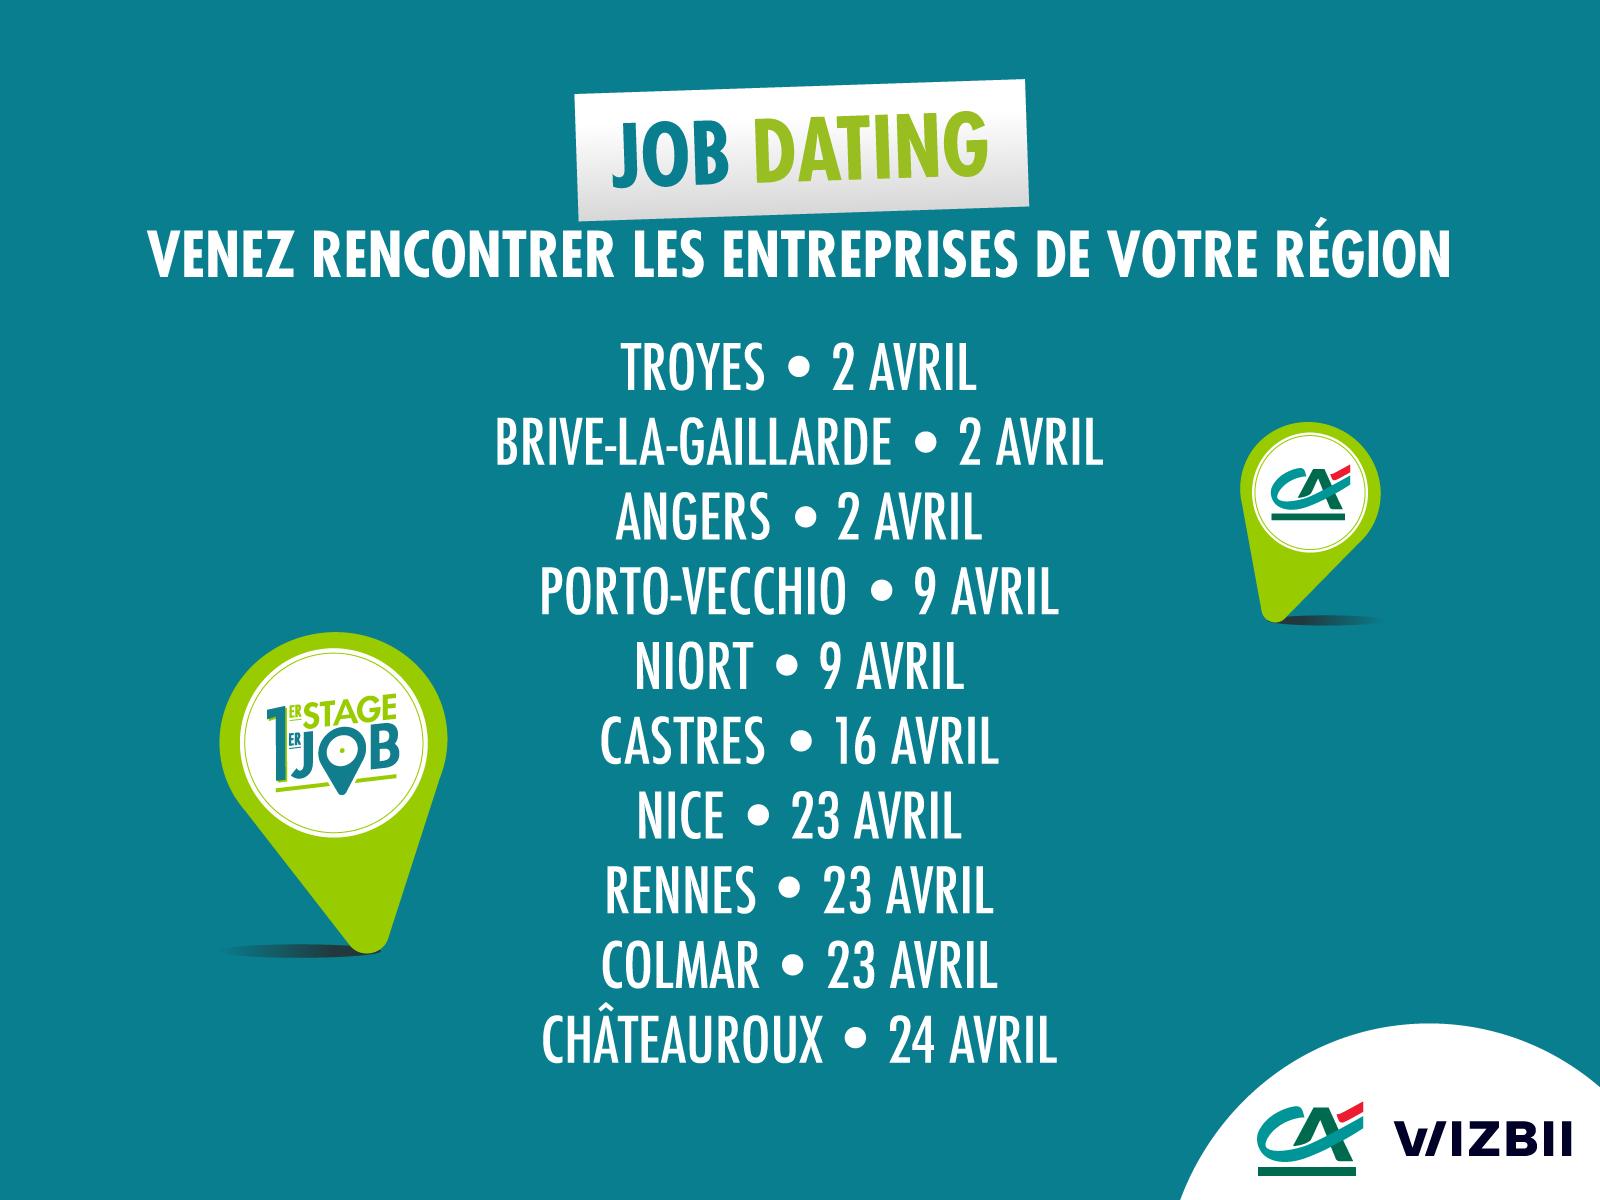 job dating alternance rennes coquitlam dating